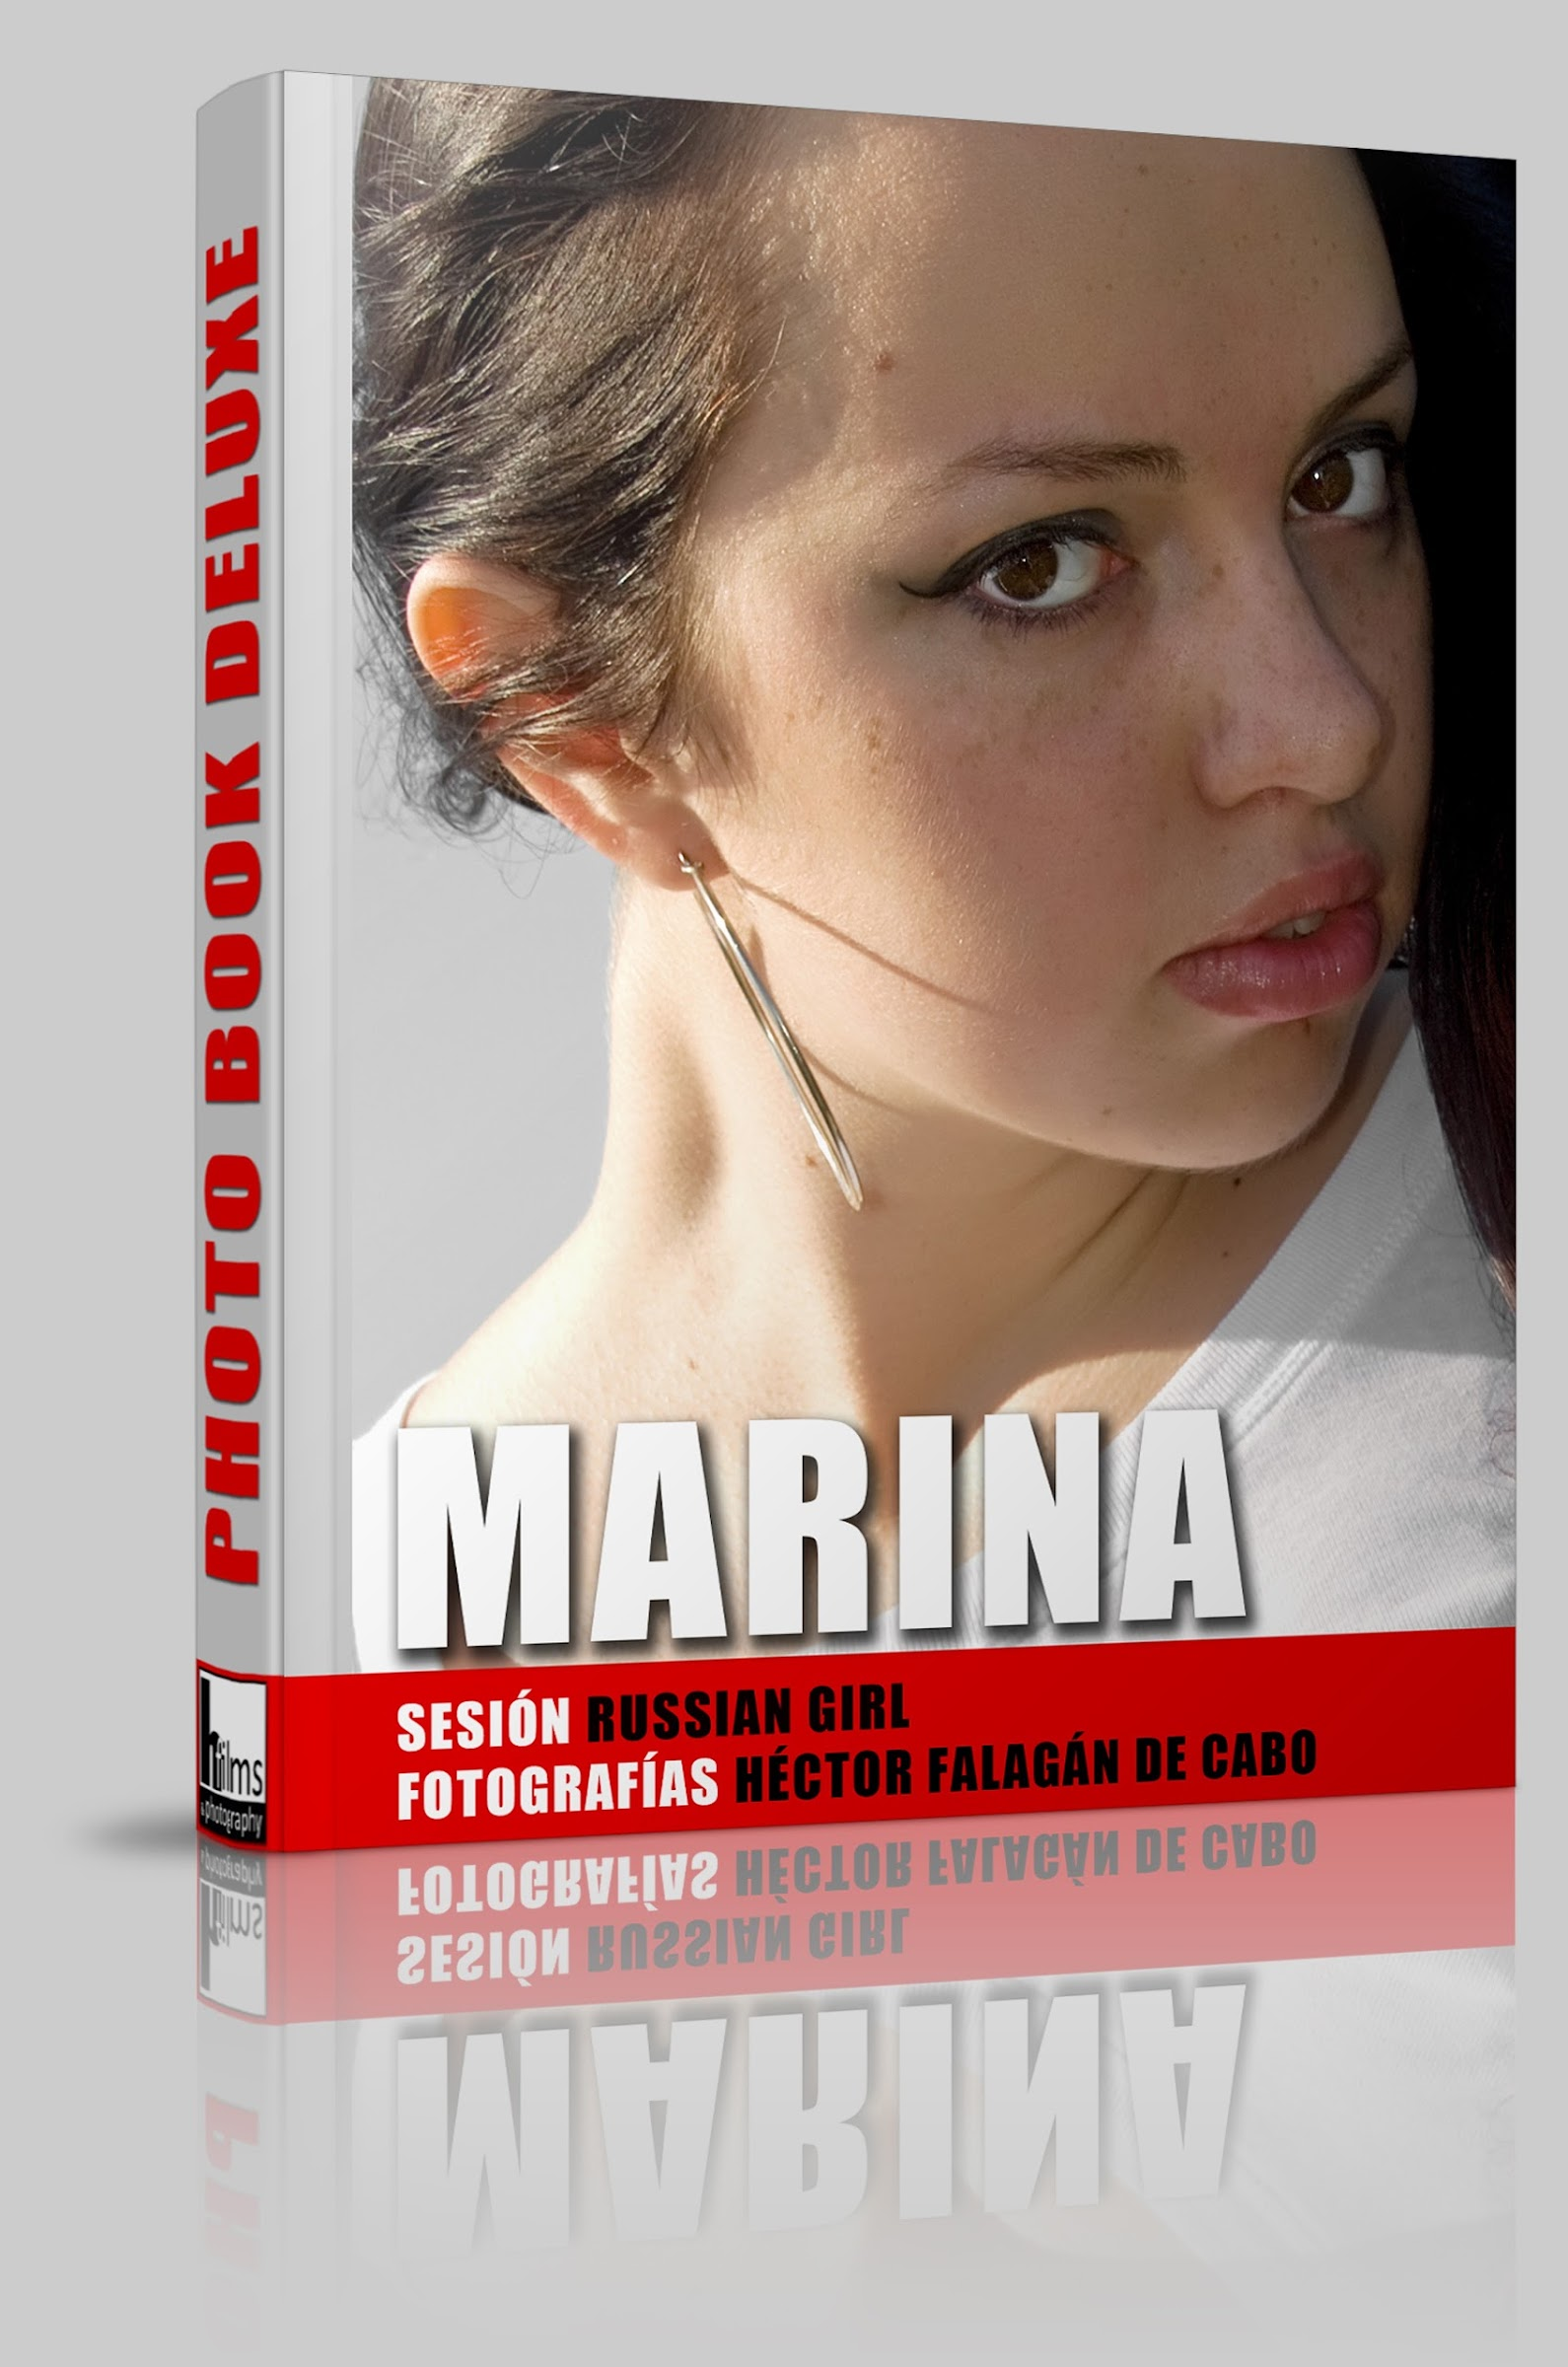 Fotografía Modelos Habana. Marina: Russian Girl. Héctor Falagán De Cabo | hfilms & photography. La Habana, Cuba.